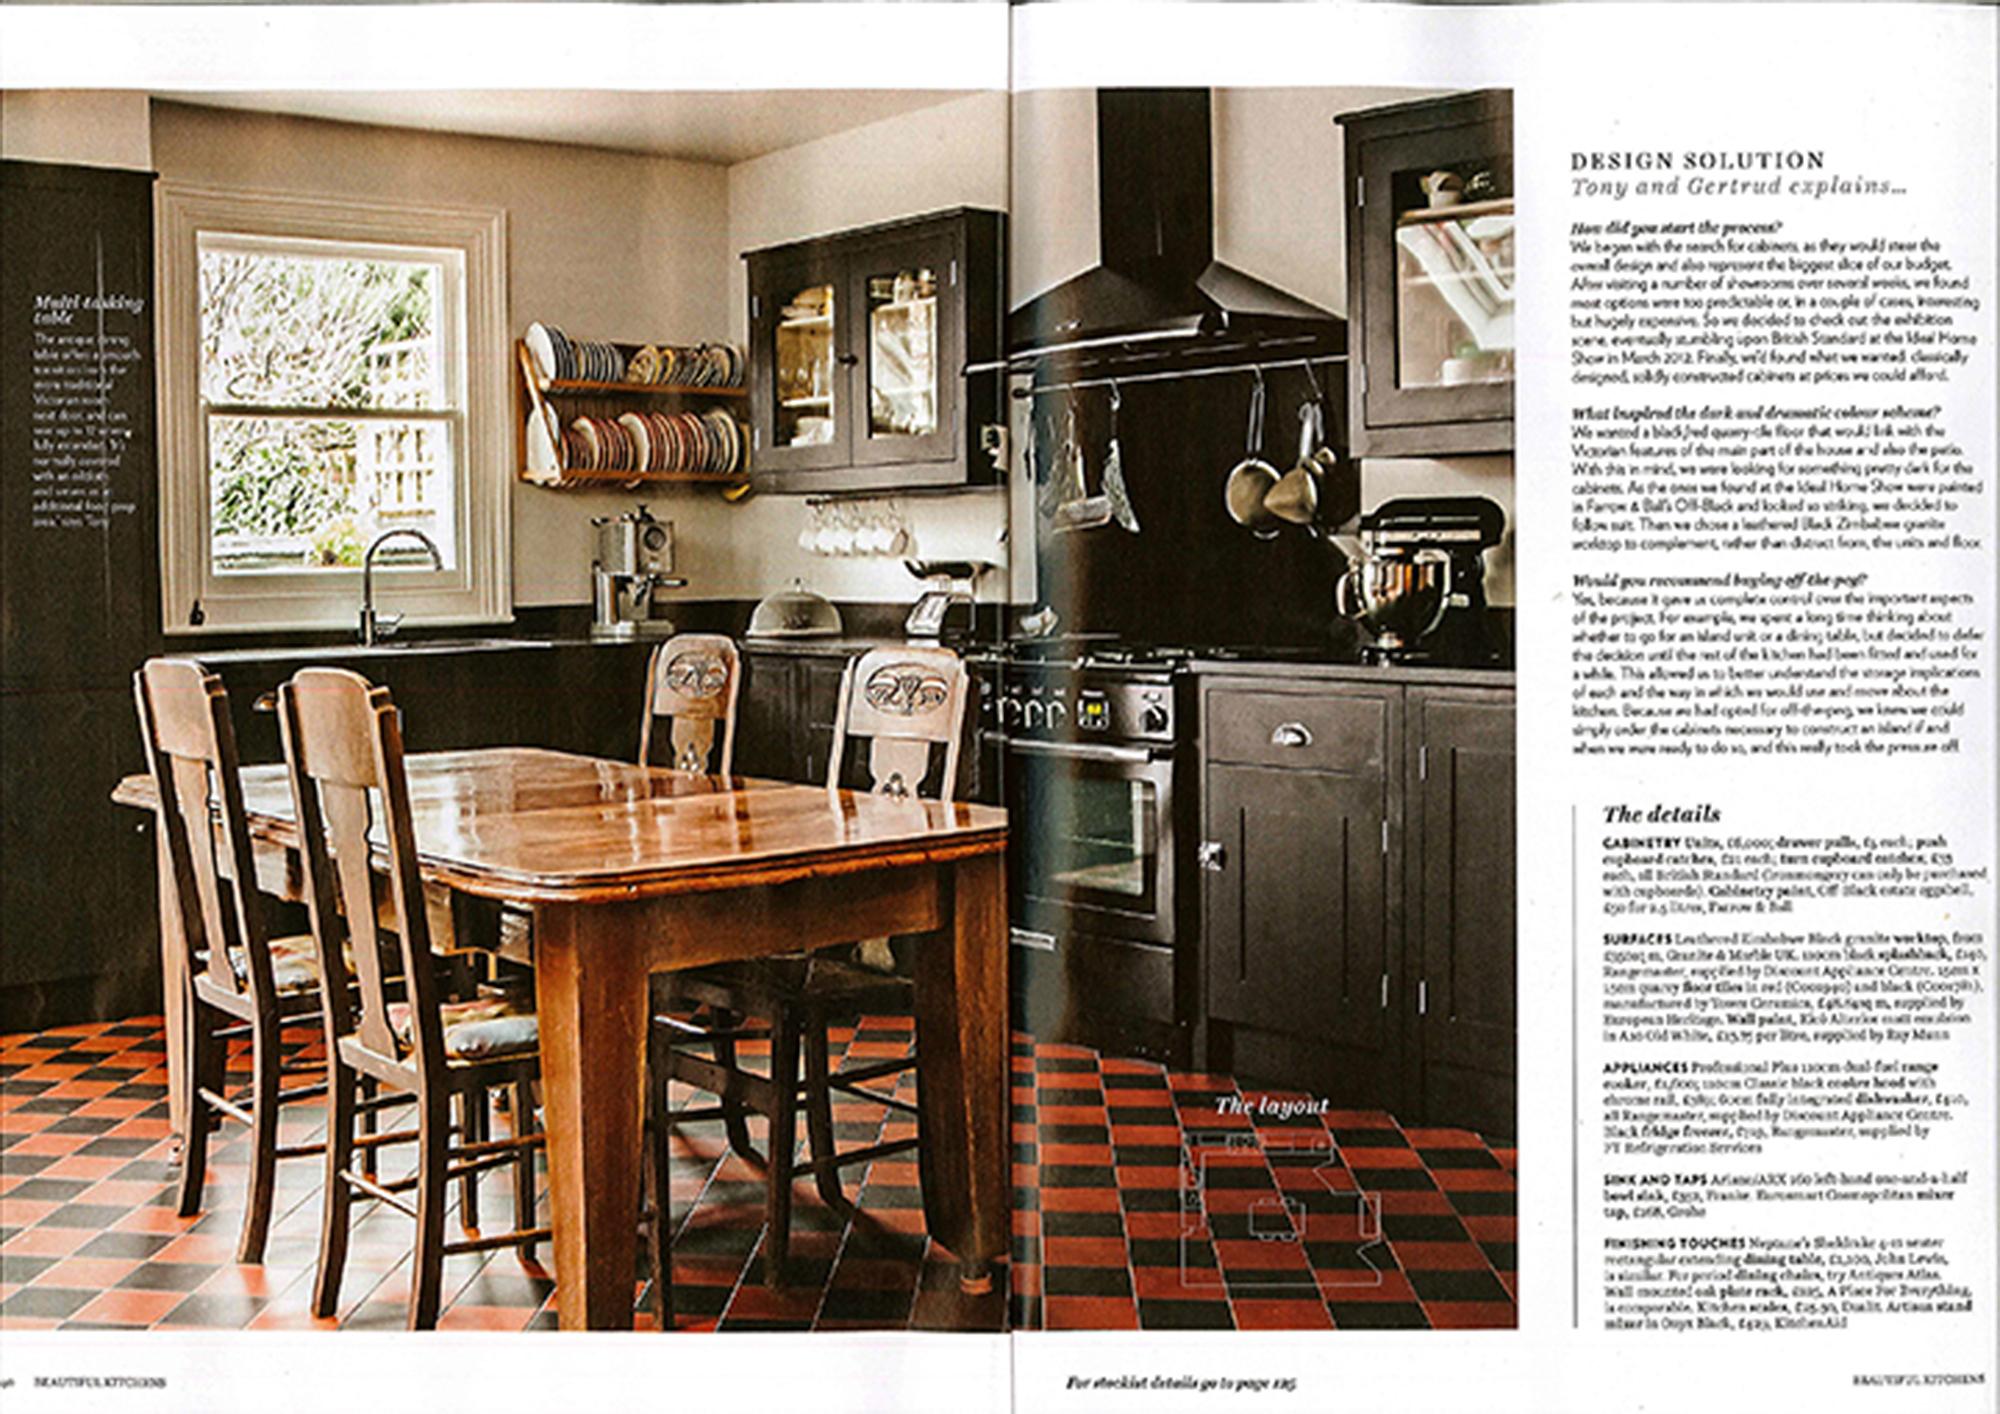 British-Standard-Beautiful-kitchens-3LR.jpg